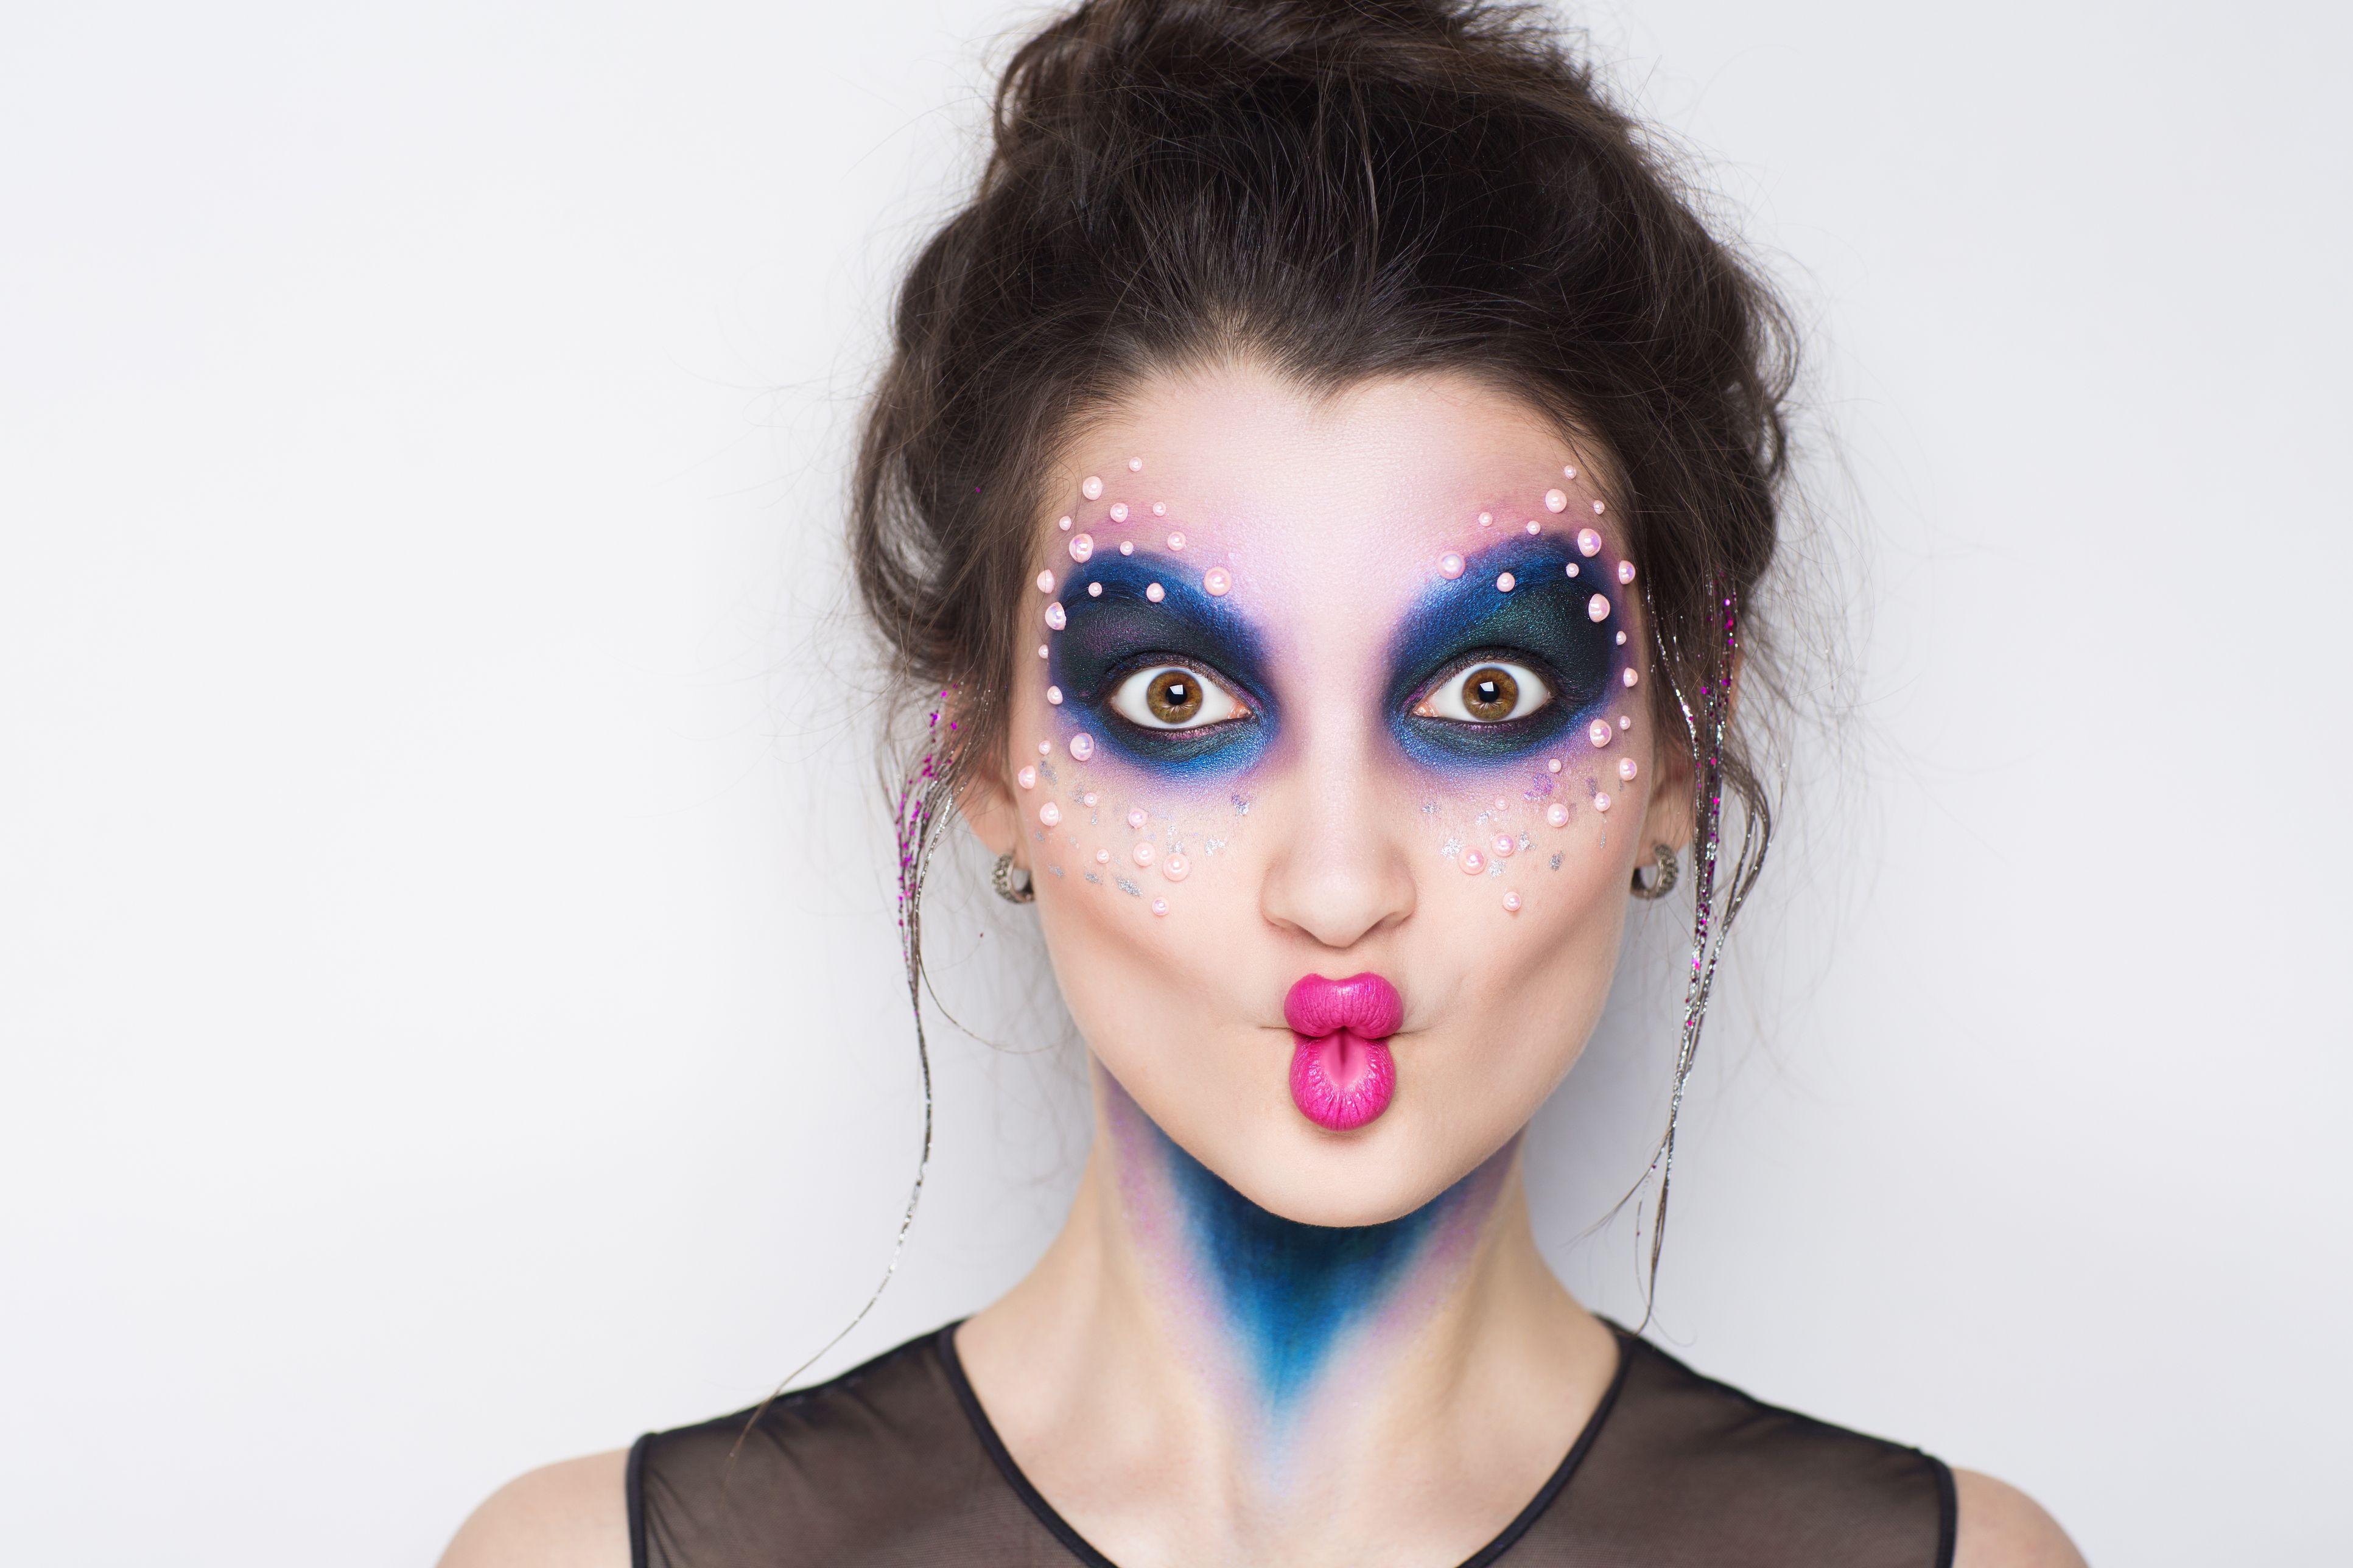 10 Best Halloween Makeup Kits For 2018 Top Costume Makeup